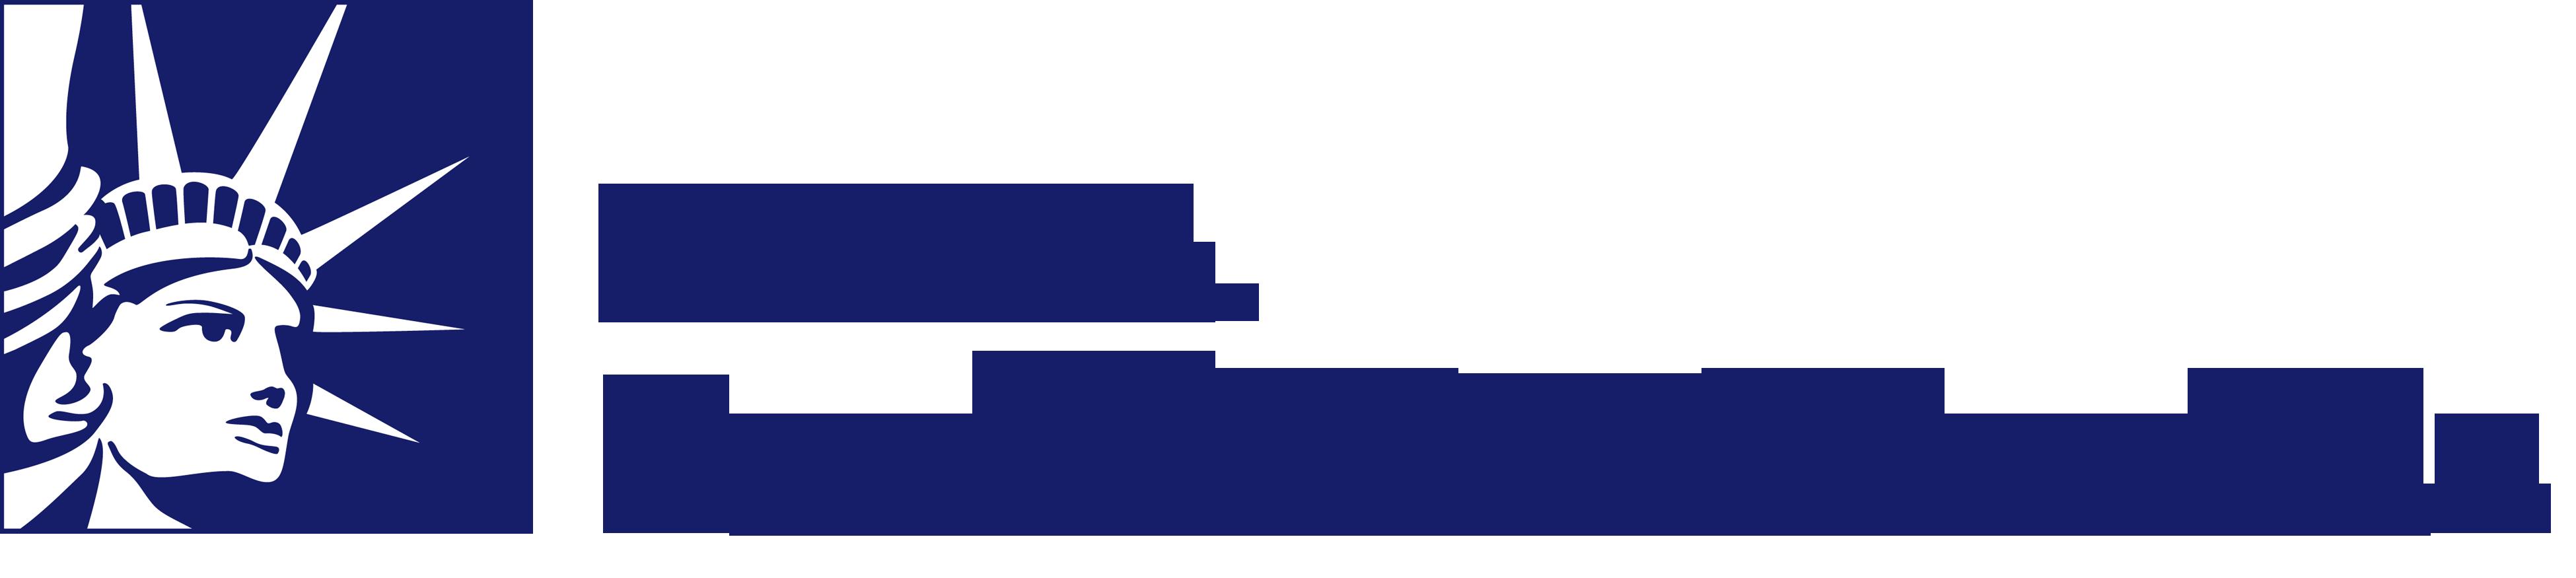 NARAL Pro-Choice Wisconsin